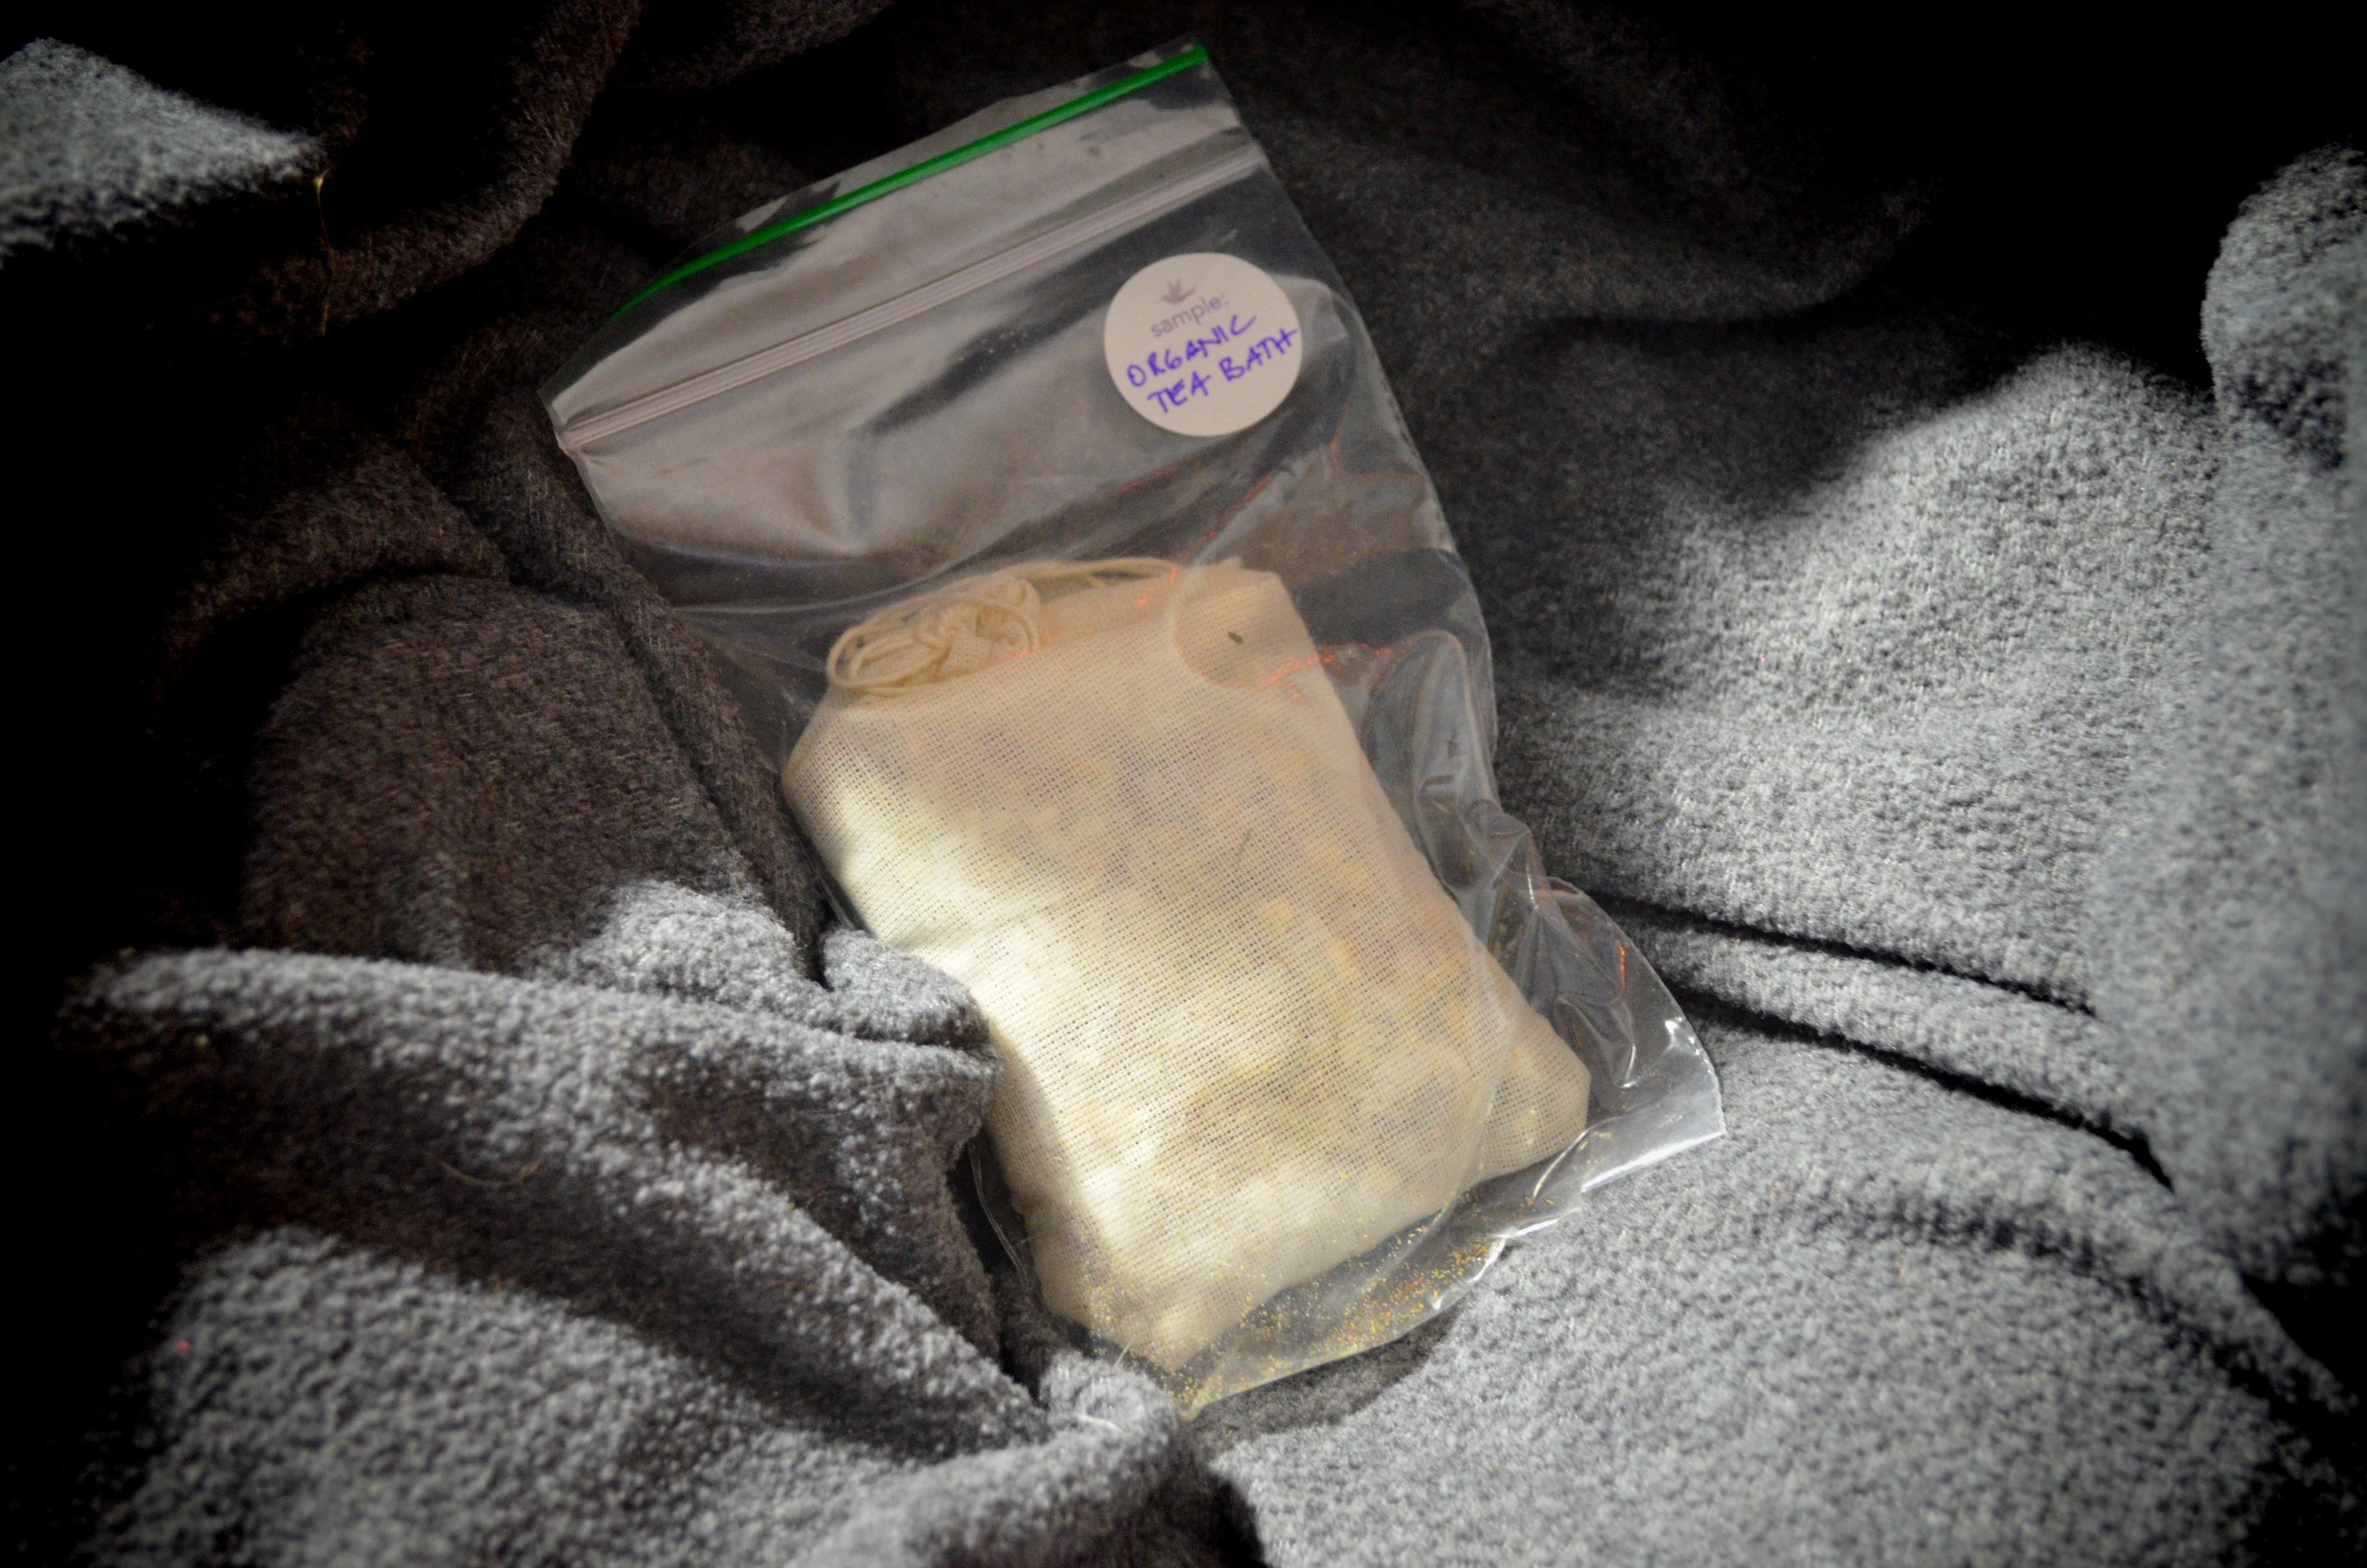 osmia organics tea bath review